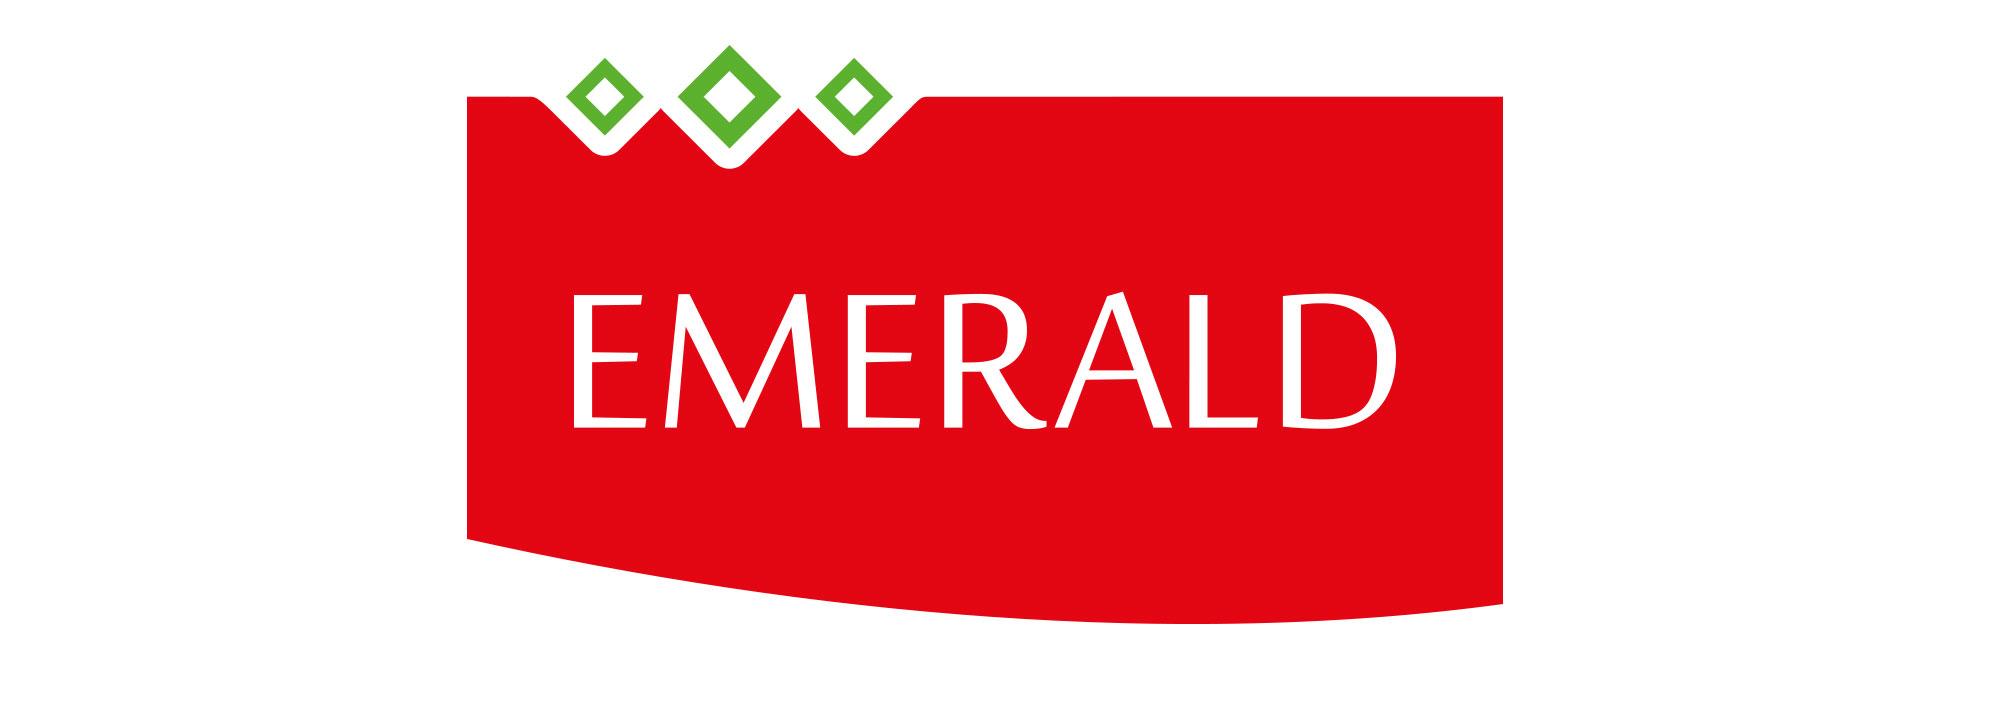 niska mlekara logo 3